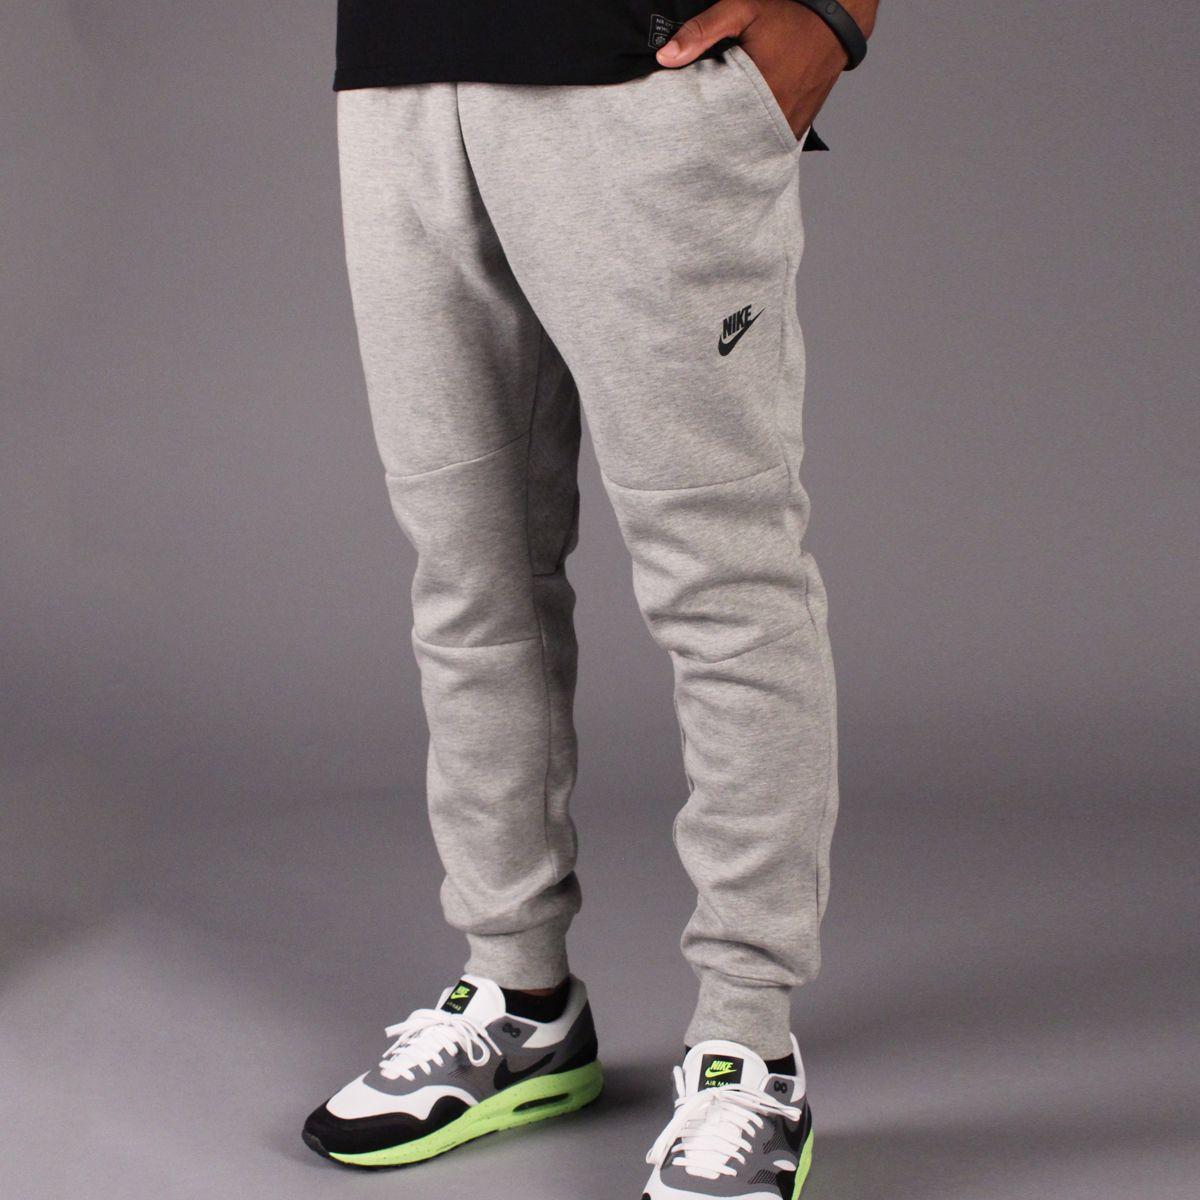 c13a2eacc928 Nike Tech Fleece Pant 1MM (Dark Heather Grey Black)